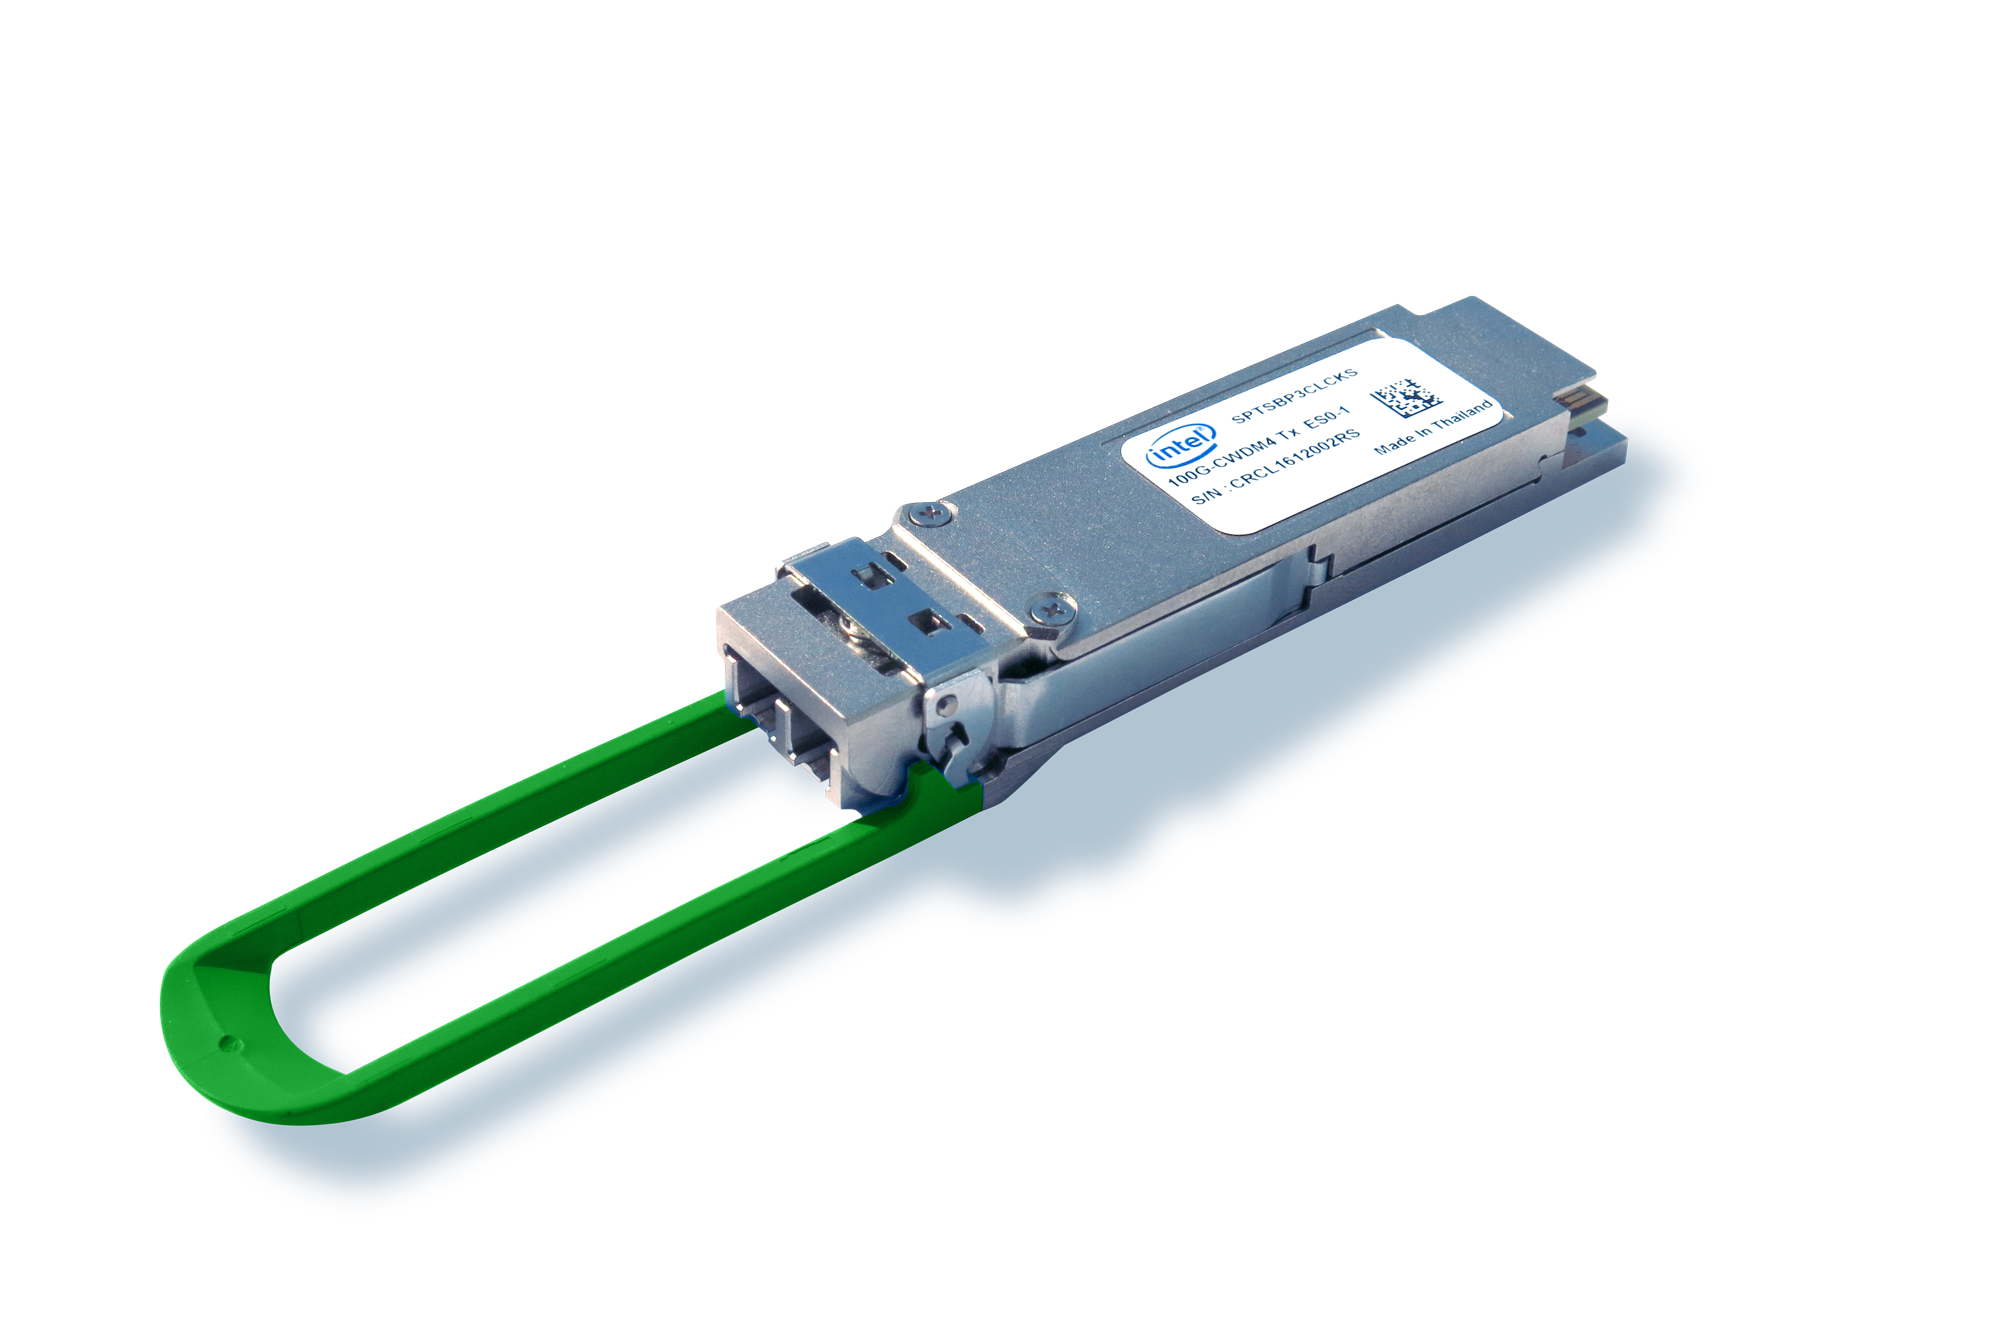 Intel® Silicon Photonics 100G CWDM4 QSFP28 Optical Transceiver